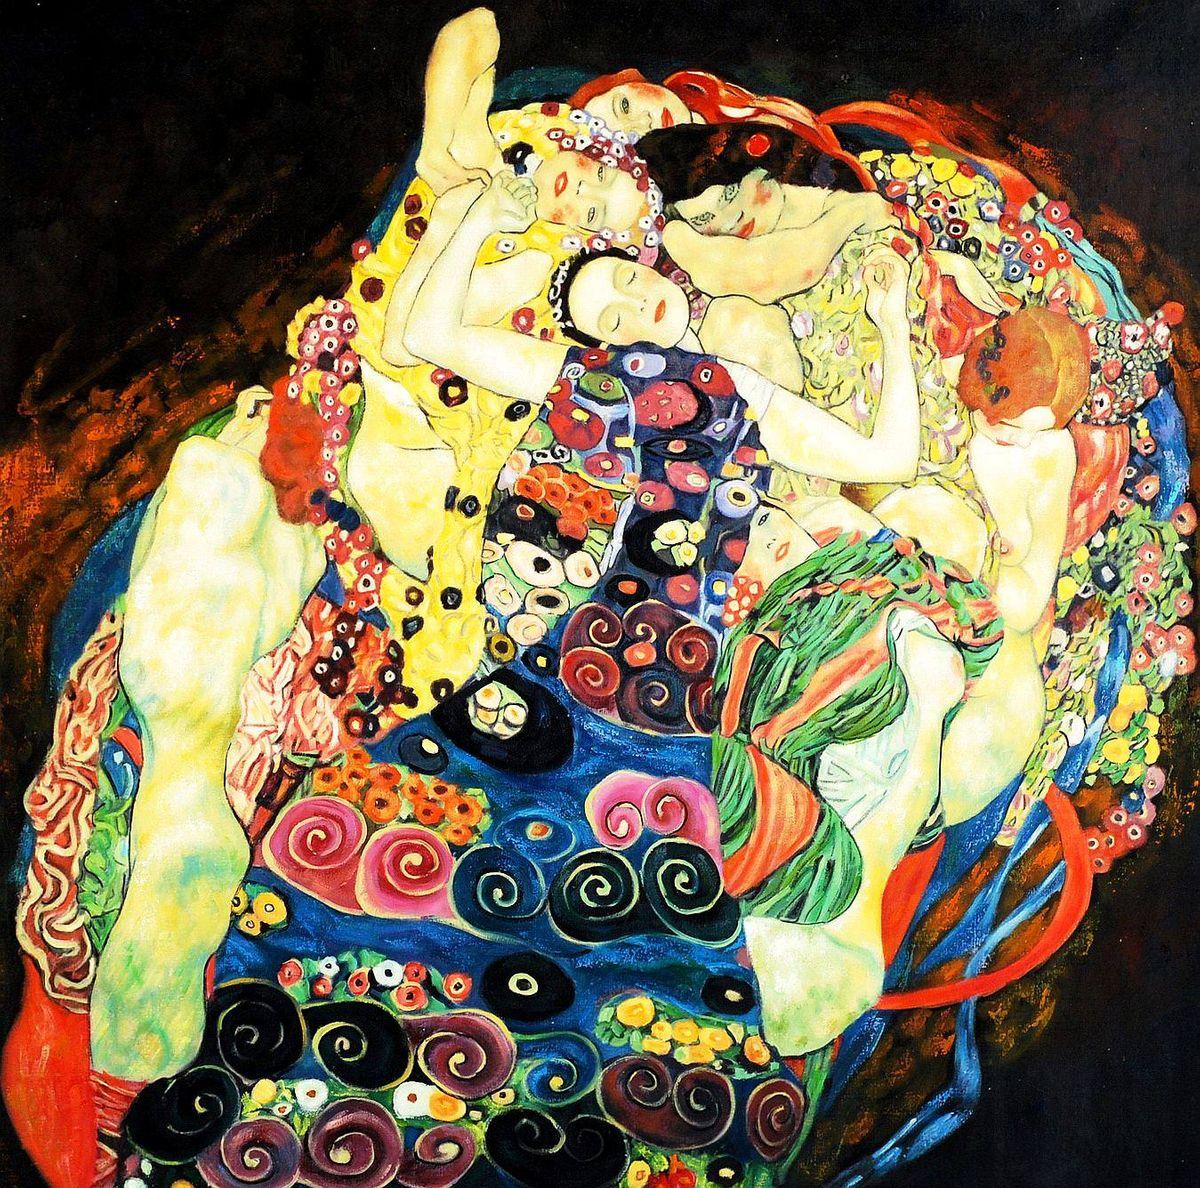 Gustav Klimt - Jungfrauen g93855 80x80cm Jugendstil Ölgemälde handgemalt Museumsqualität